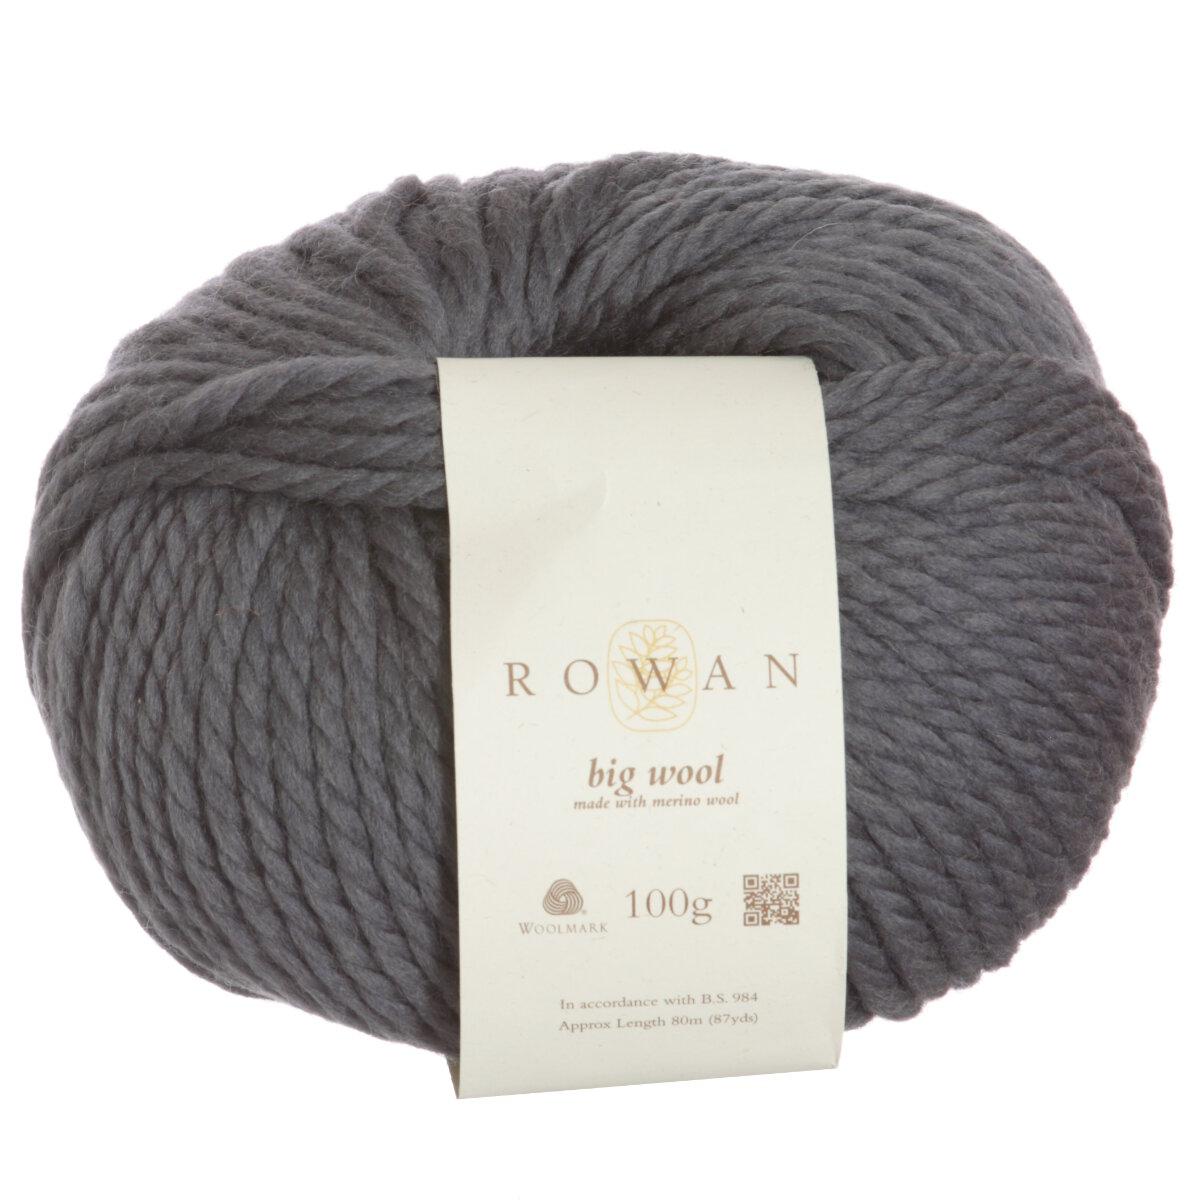 Knitting Patterns For Rowan Big Wool : Rowan Big Wool Yarn at Jimmy Beans Wool